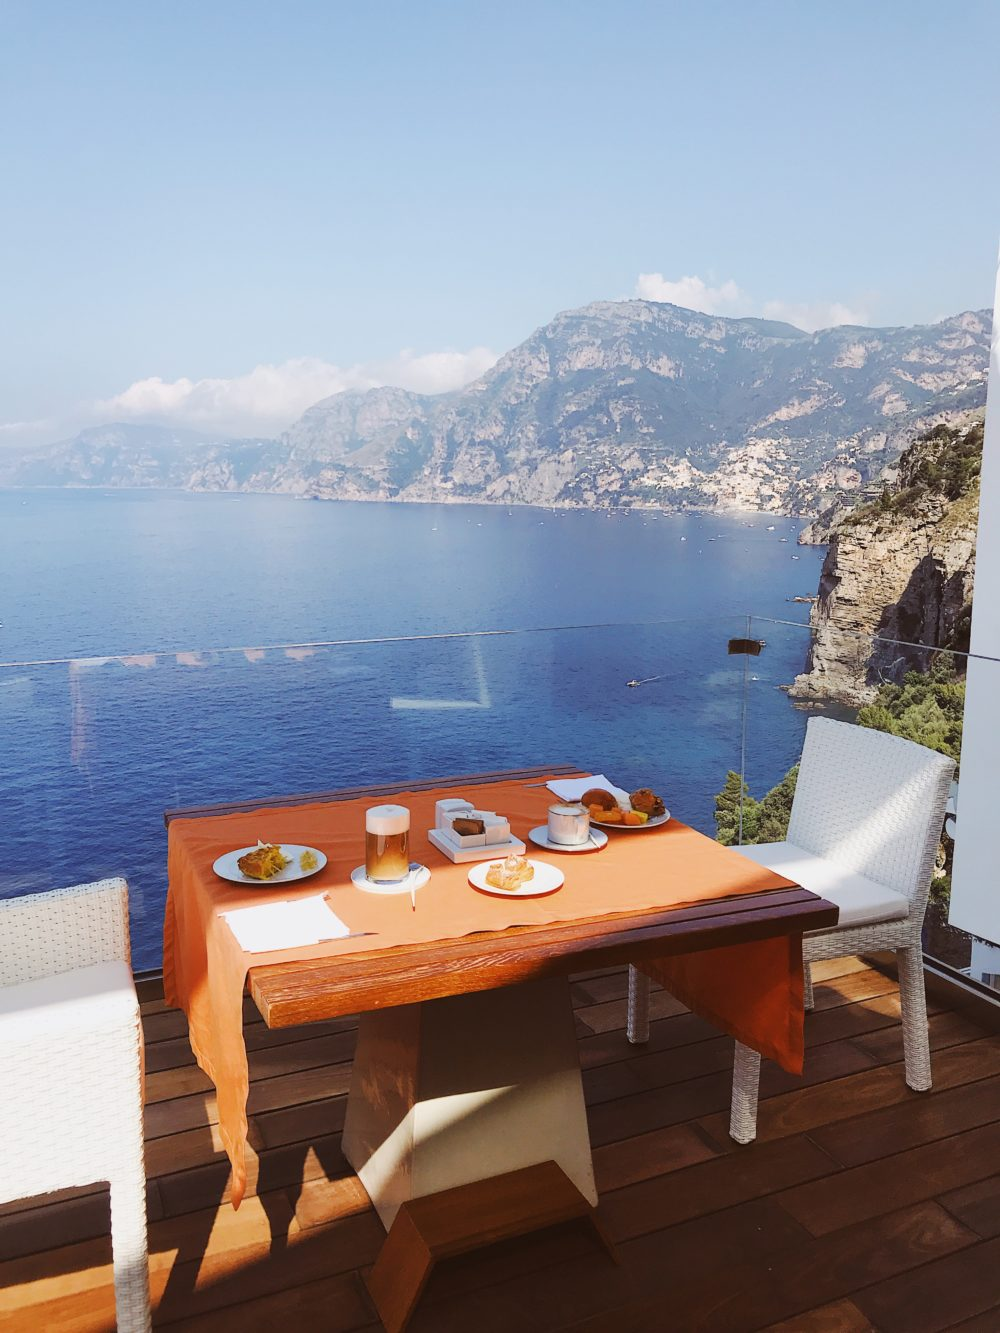 Casa-Angelina-breakfast-view-Amalfi-Coast-2-e1530895917216.jpg